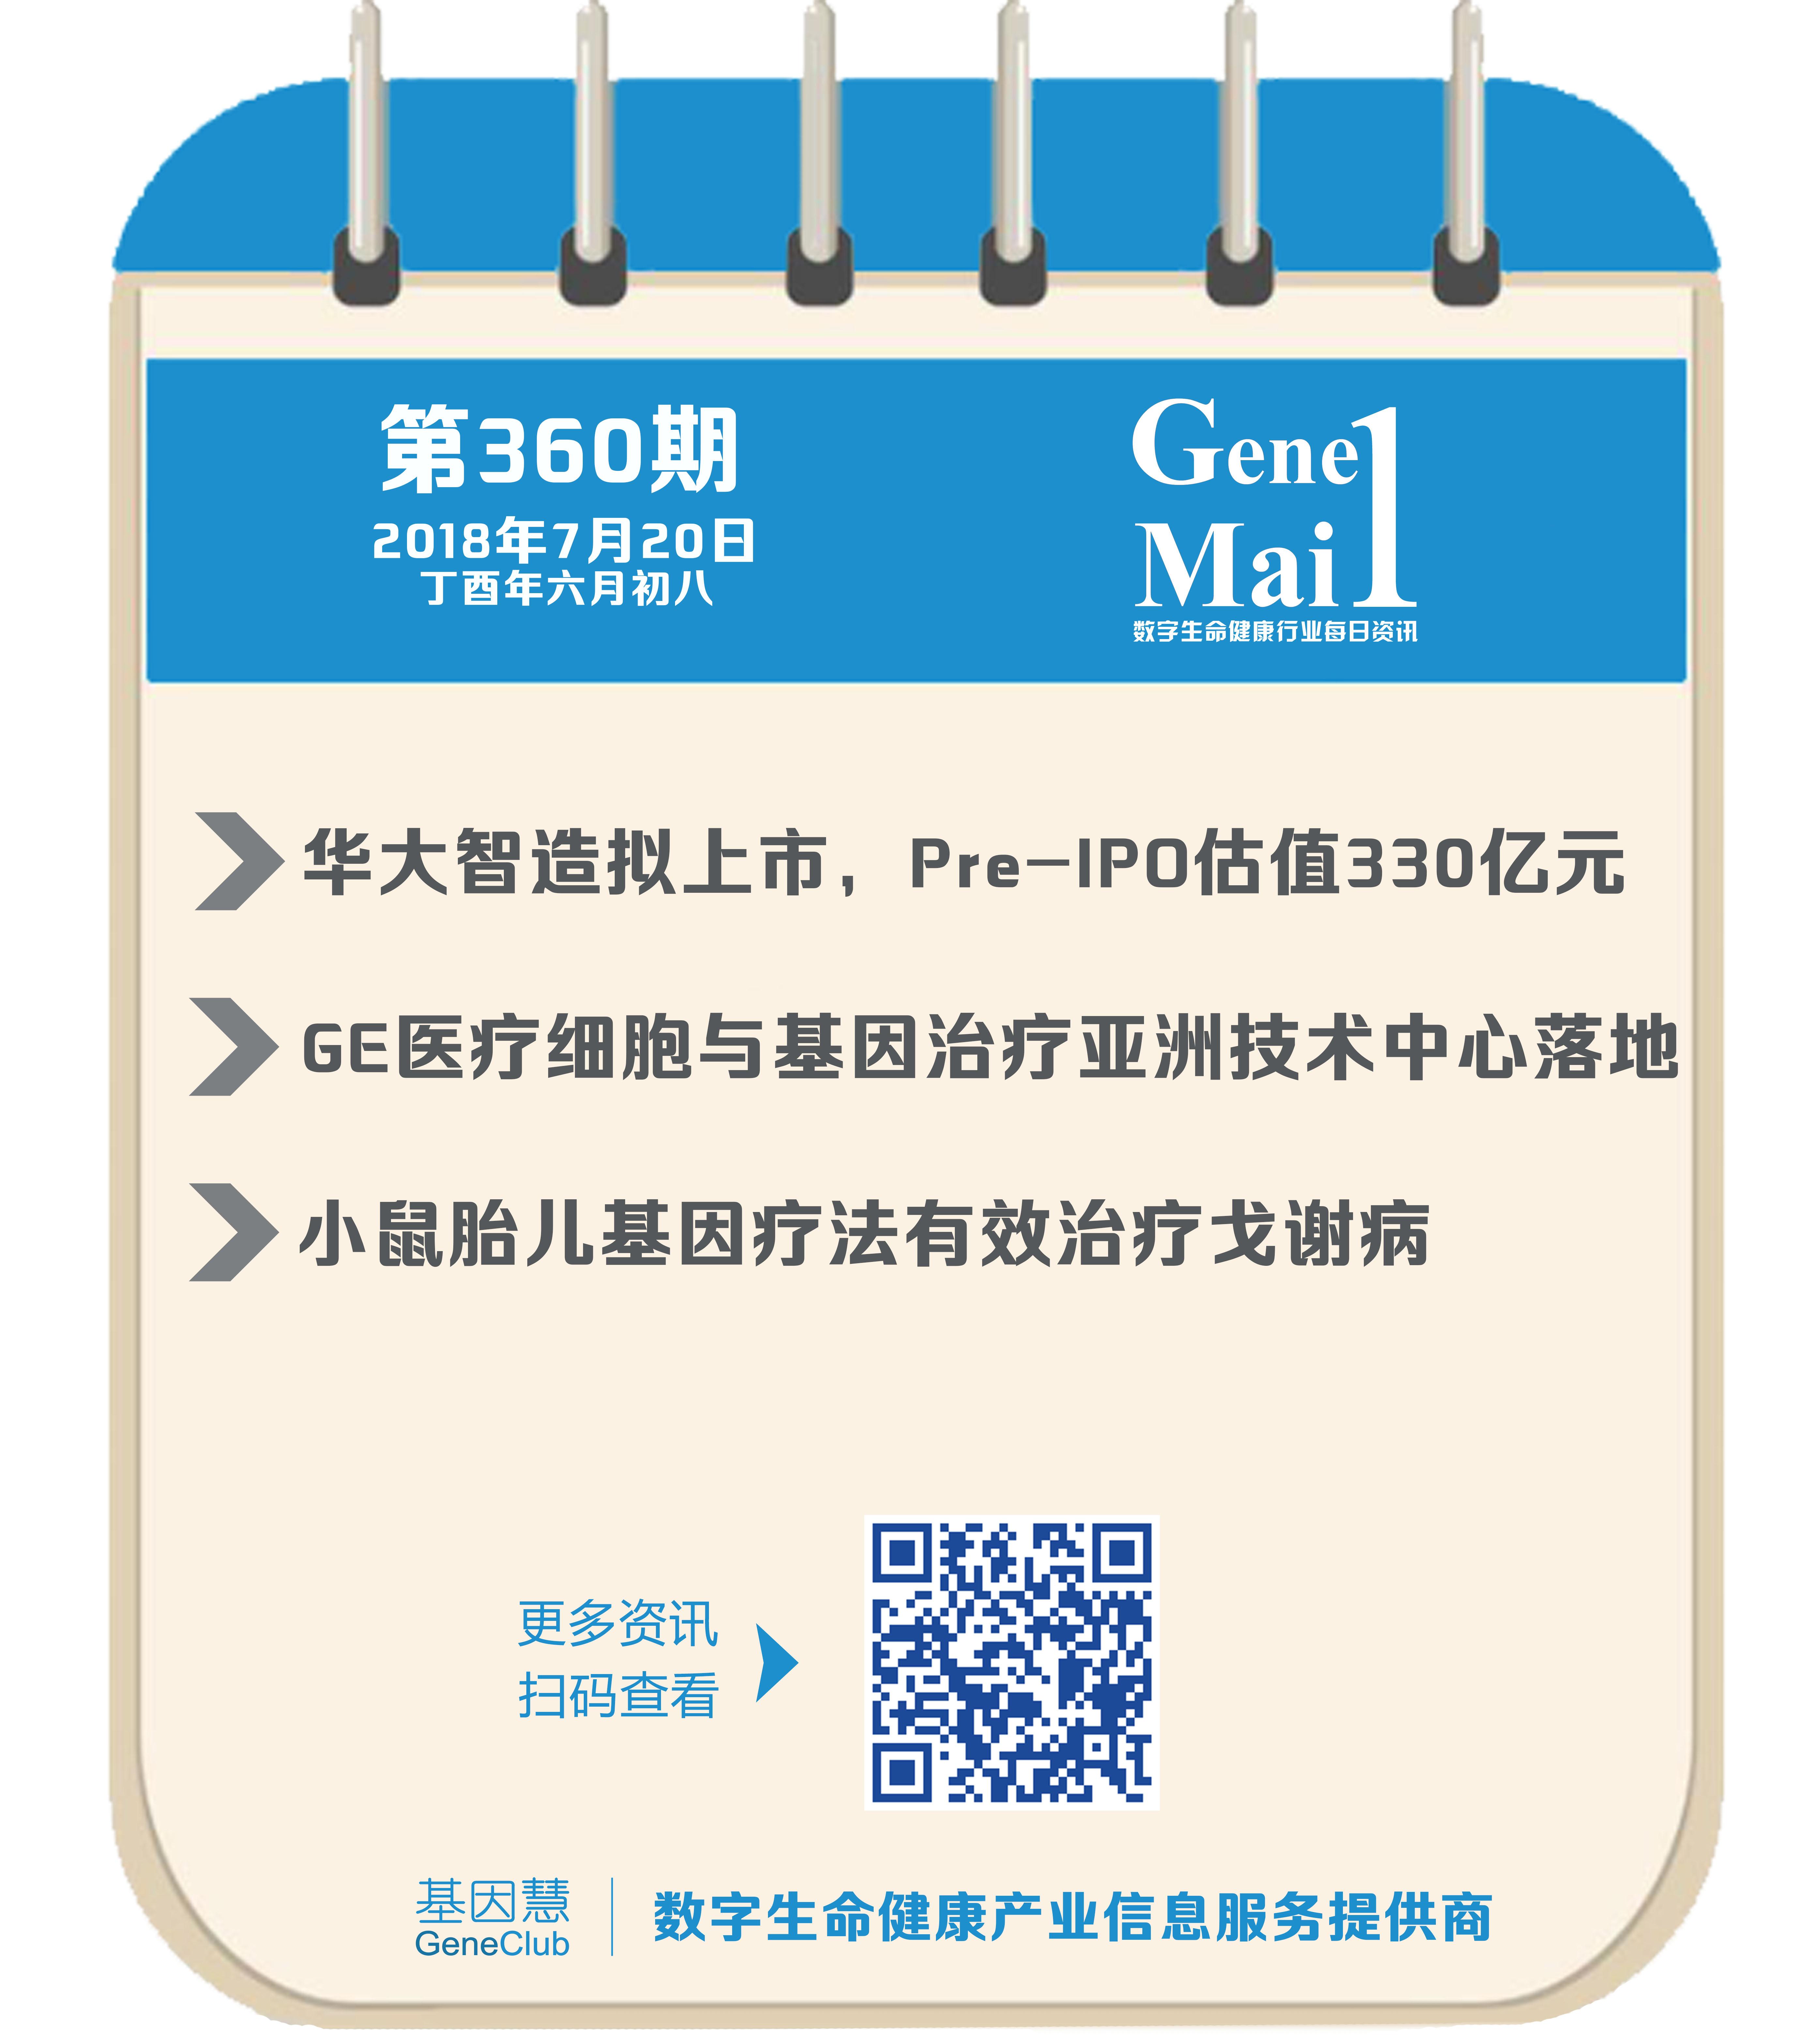 GeneMail | 华大智造拟上市;GE医疗成立上海细胞治疗与基因治疗技术中心